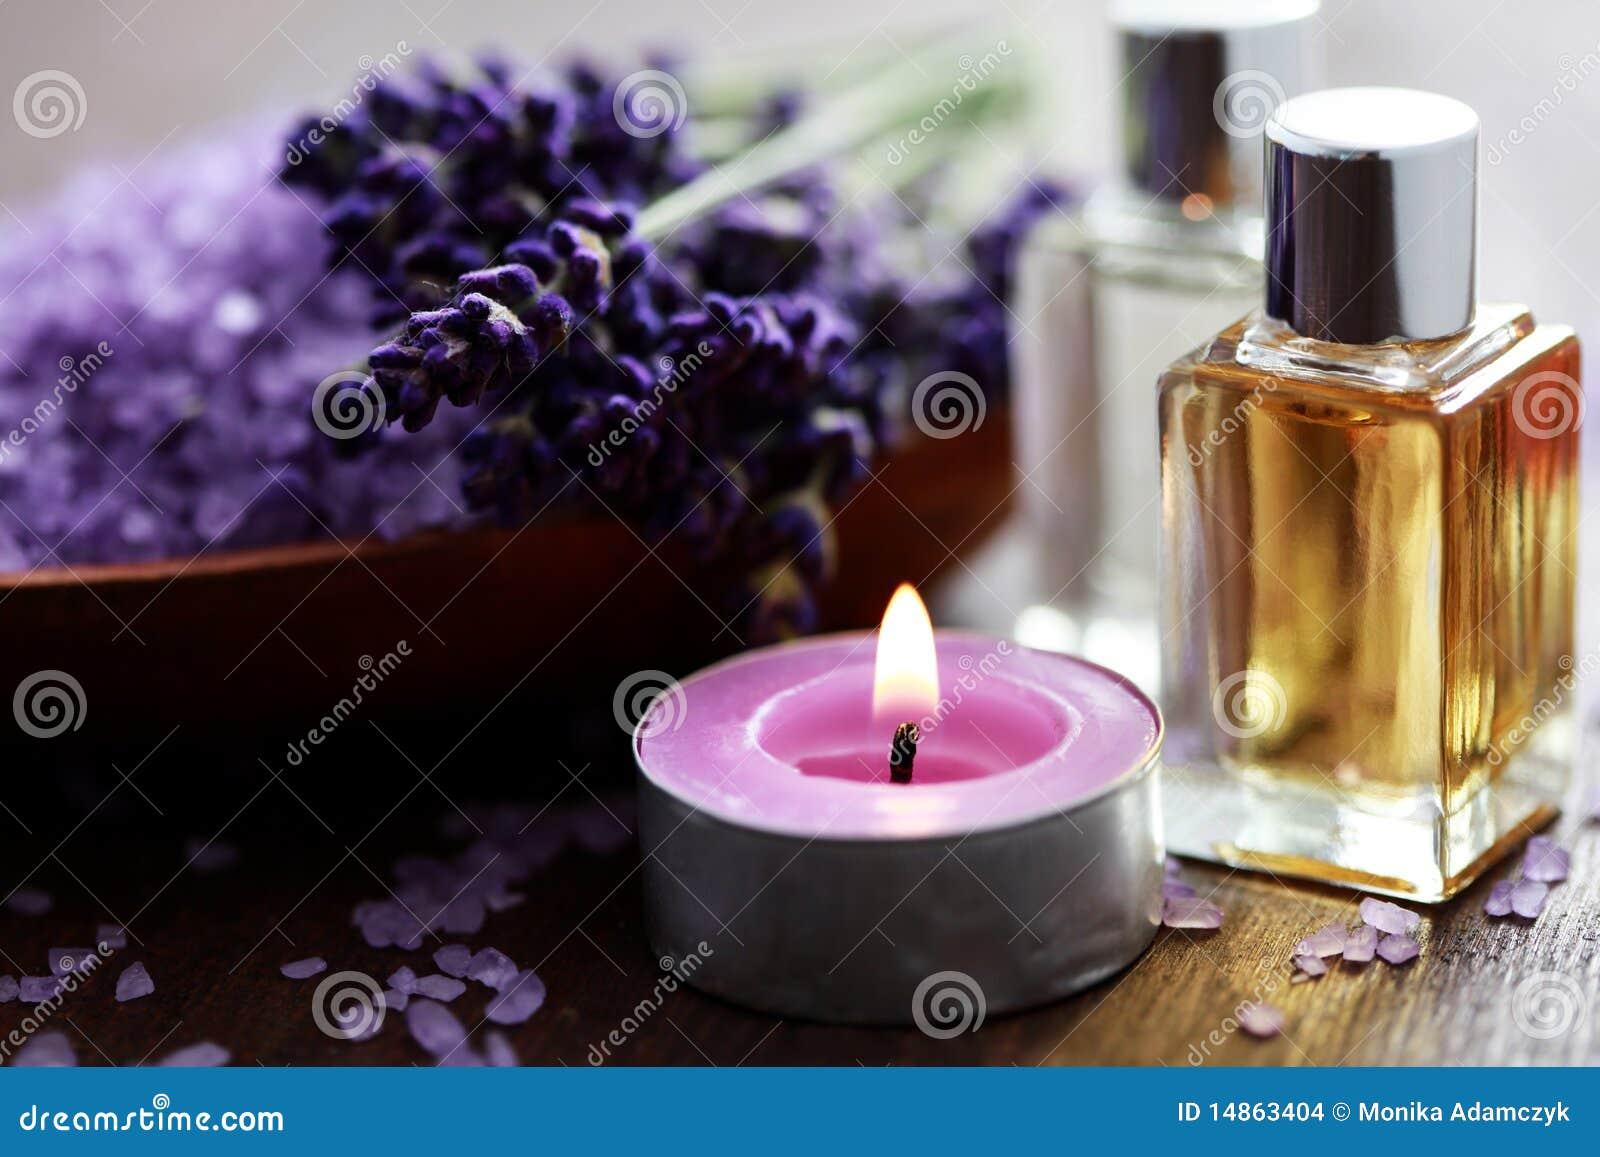 Lavender bath salt and massage oil